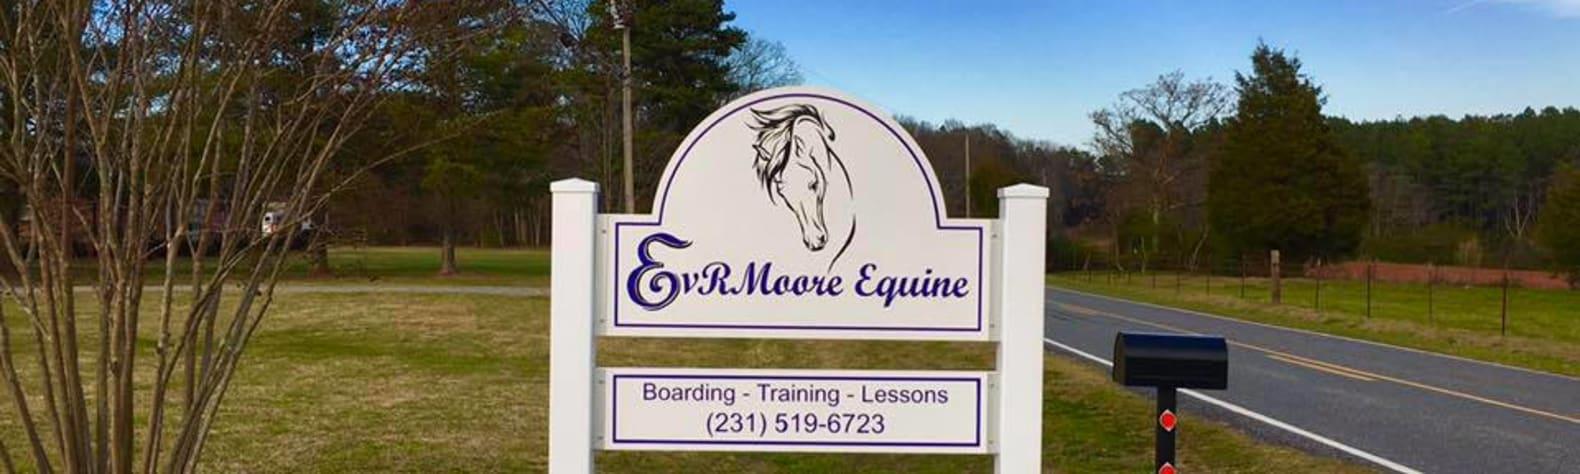 EvRMoore Equine